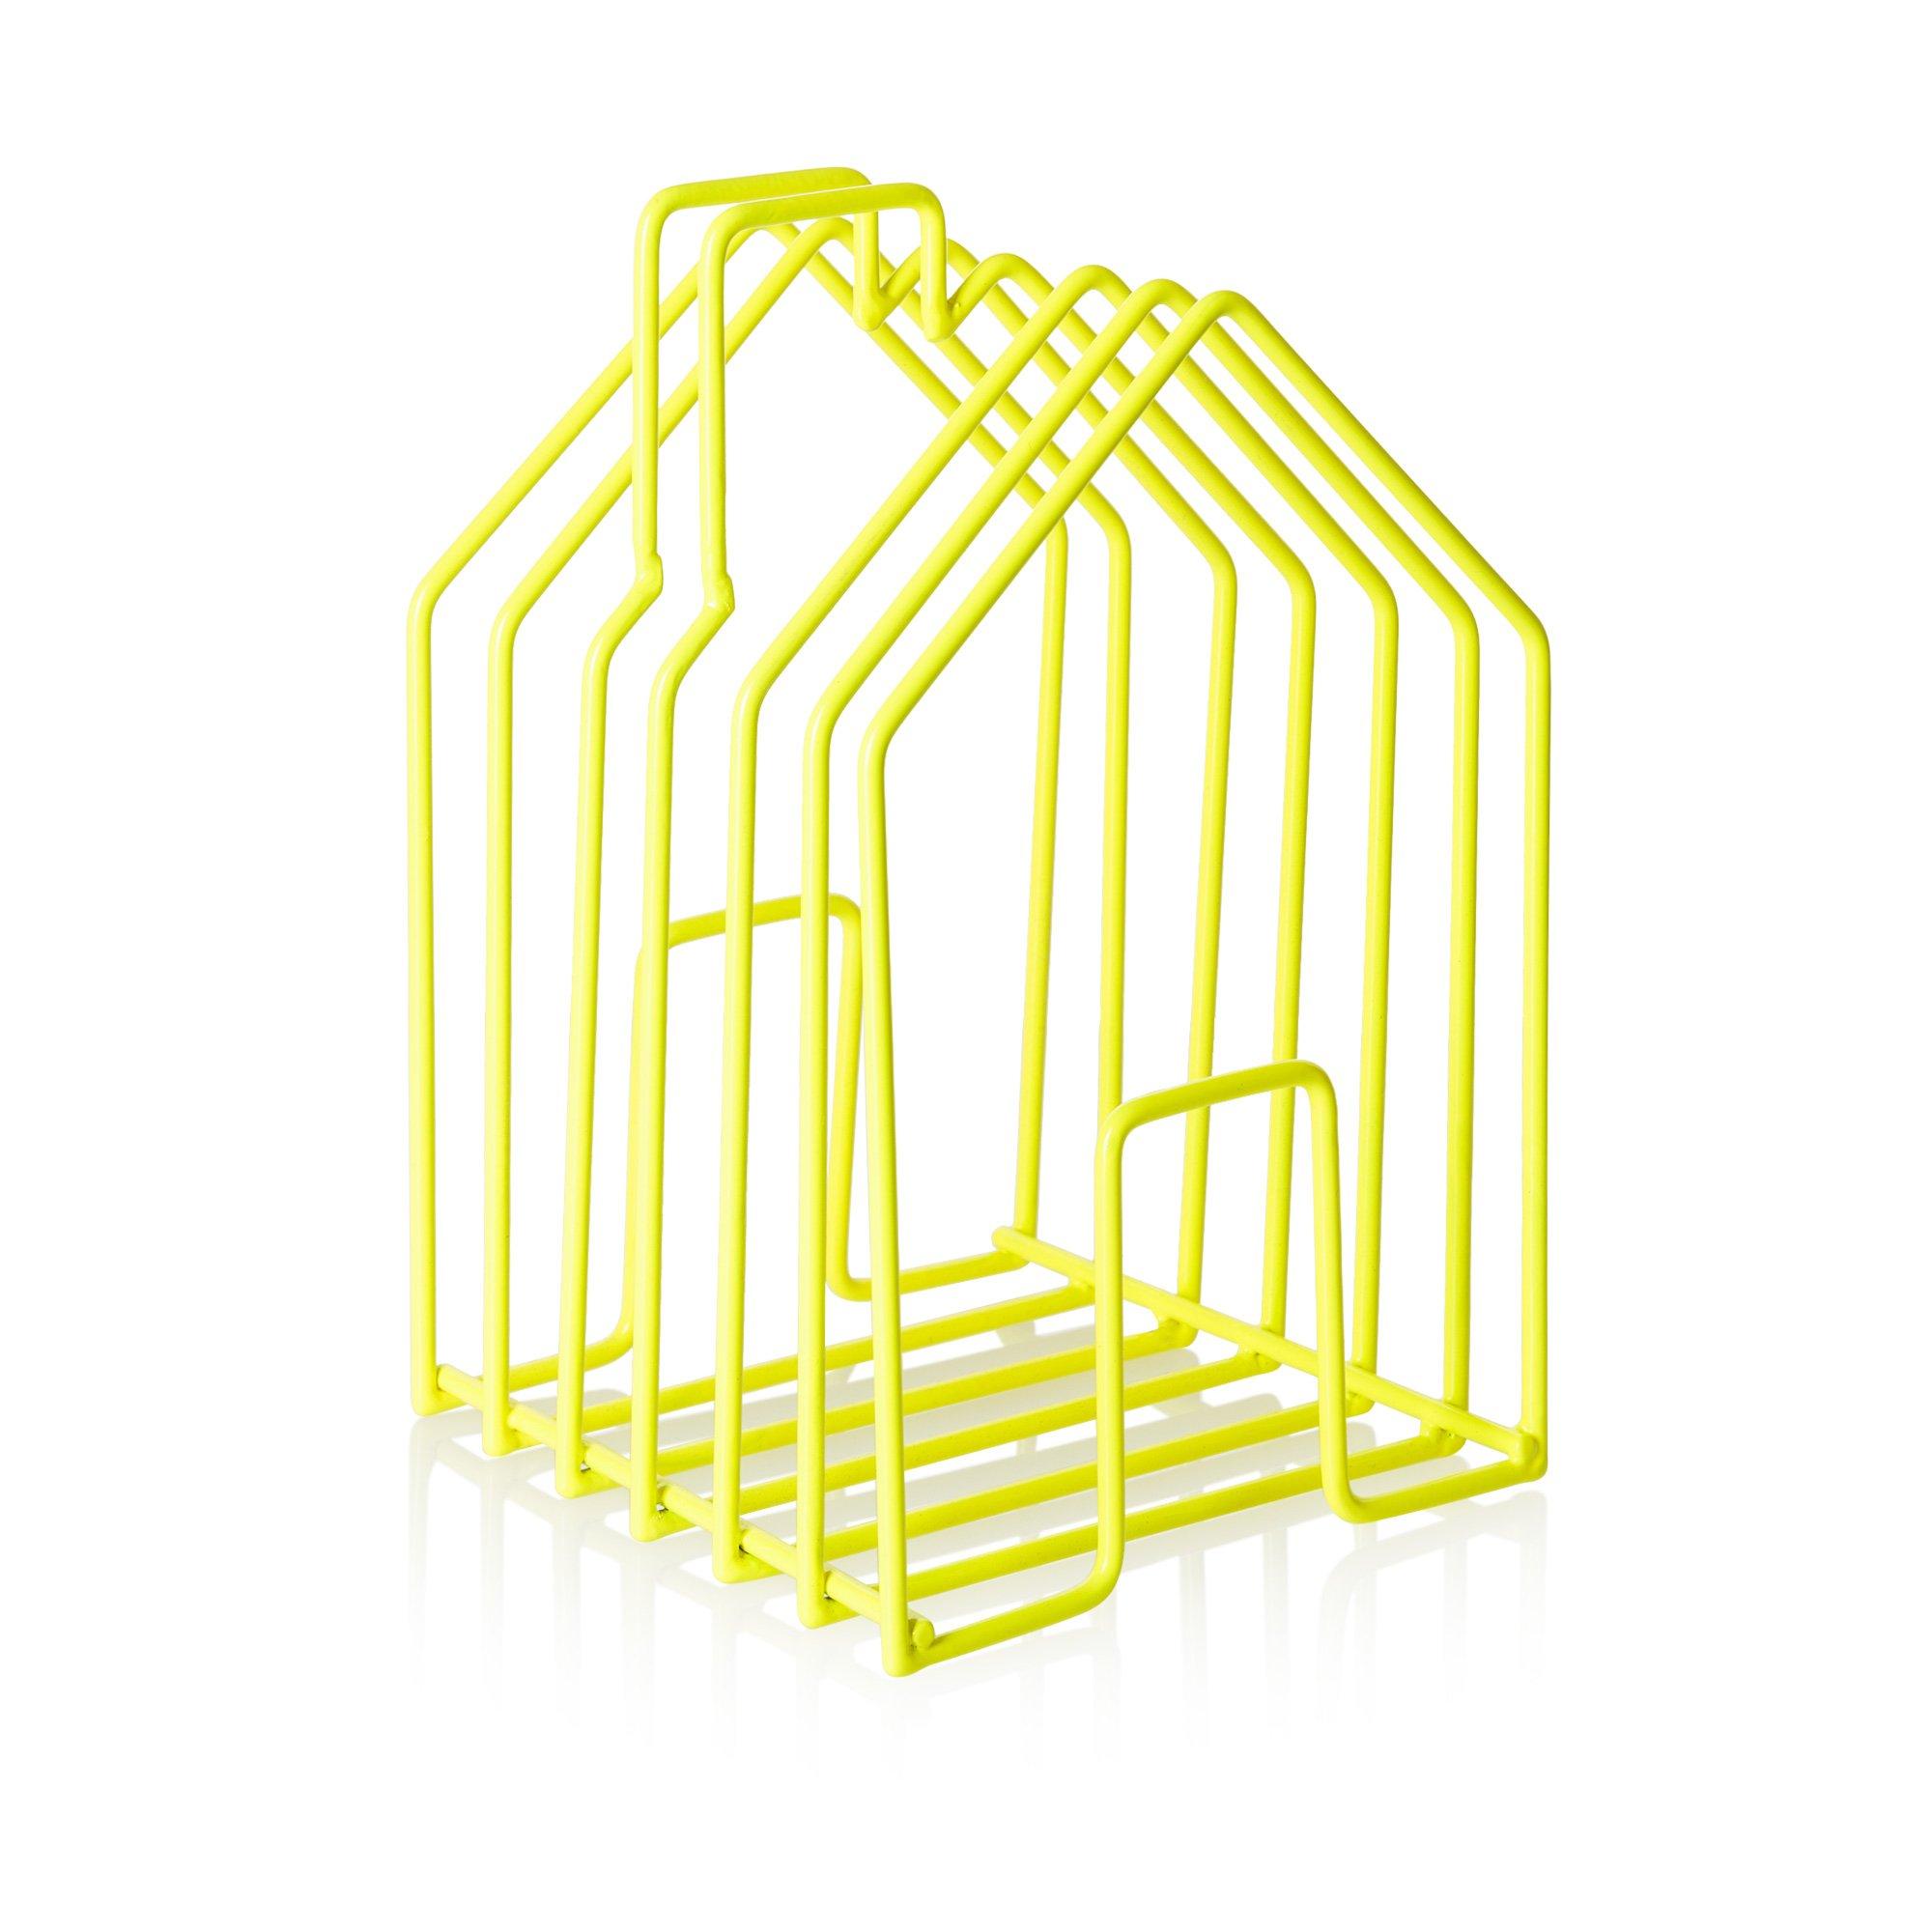 Neon Yellow Wire House Magazine Rack | Oliver Bonas